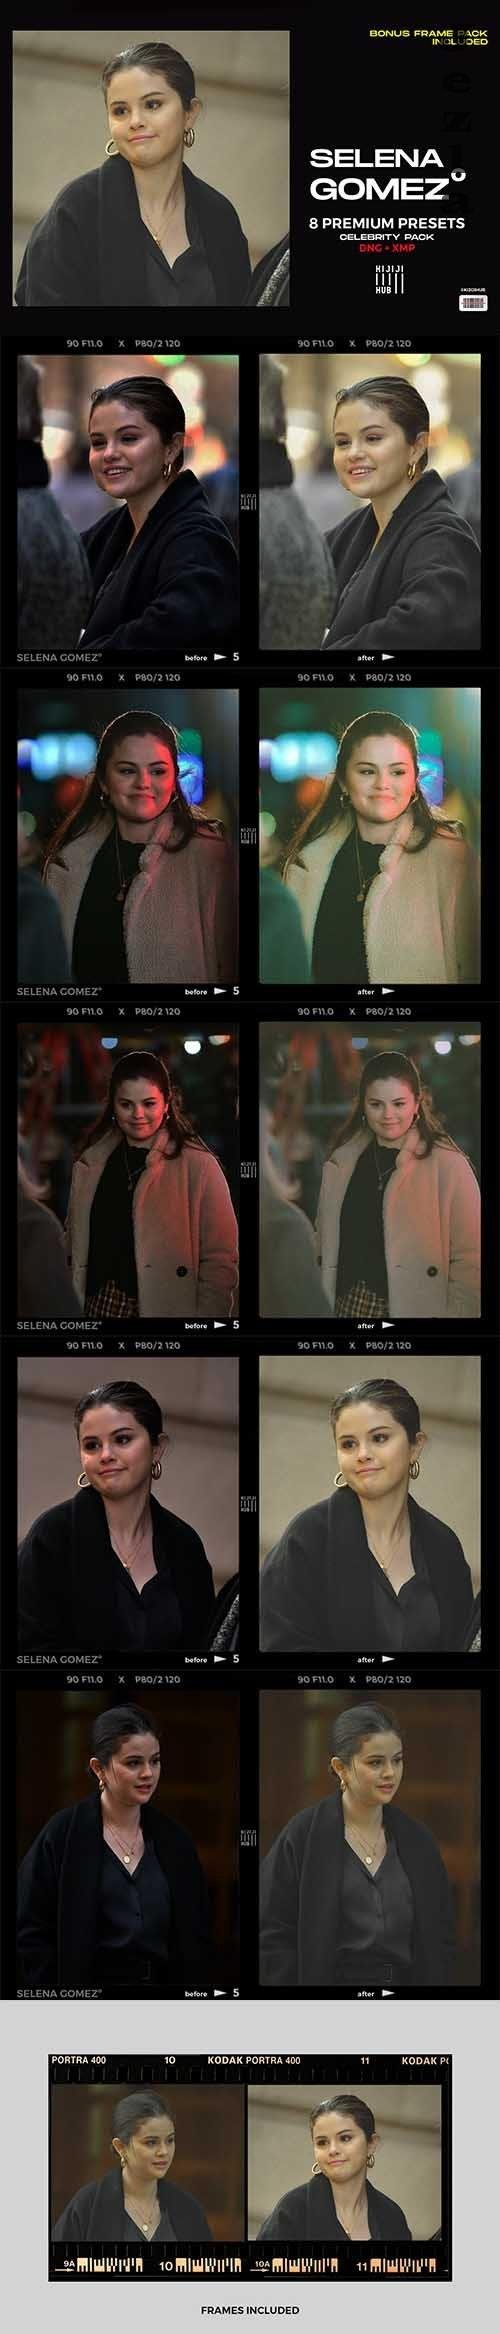 Selena Gomez LRM Presets - 6406930